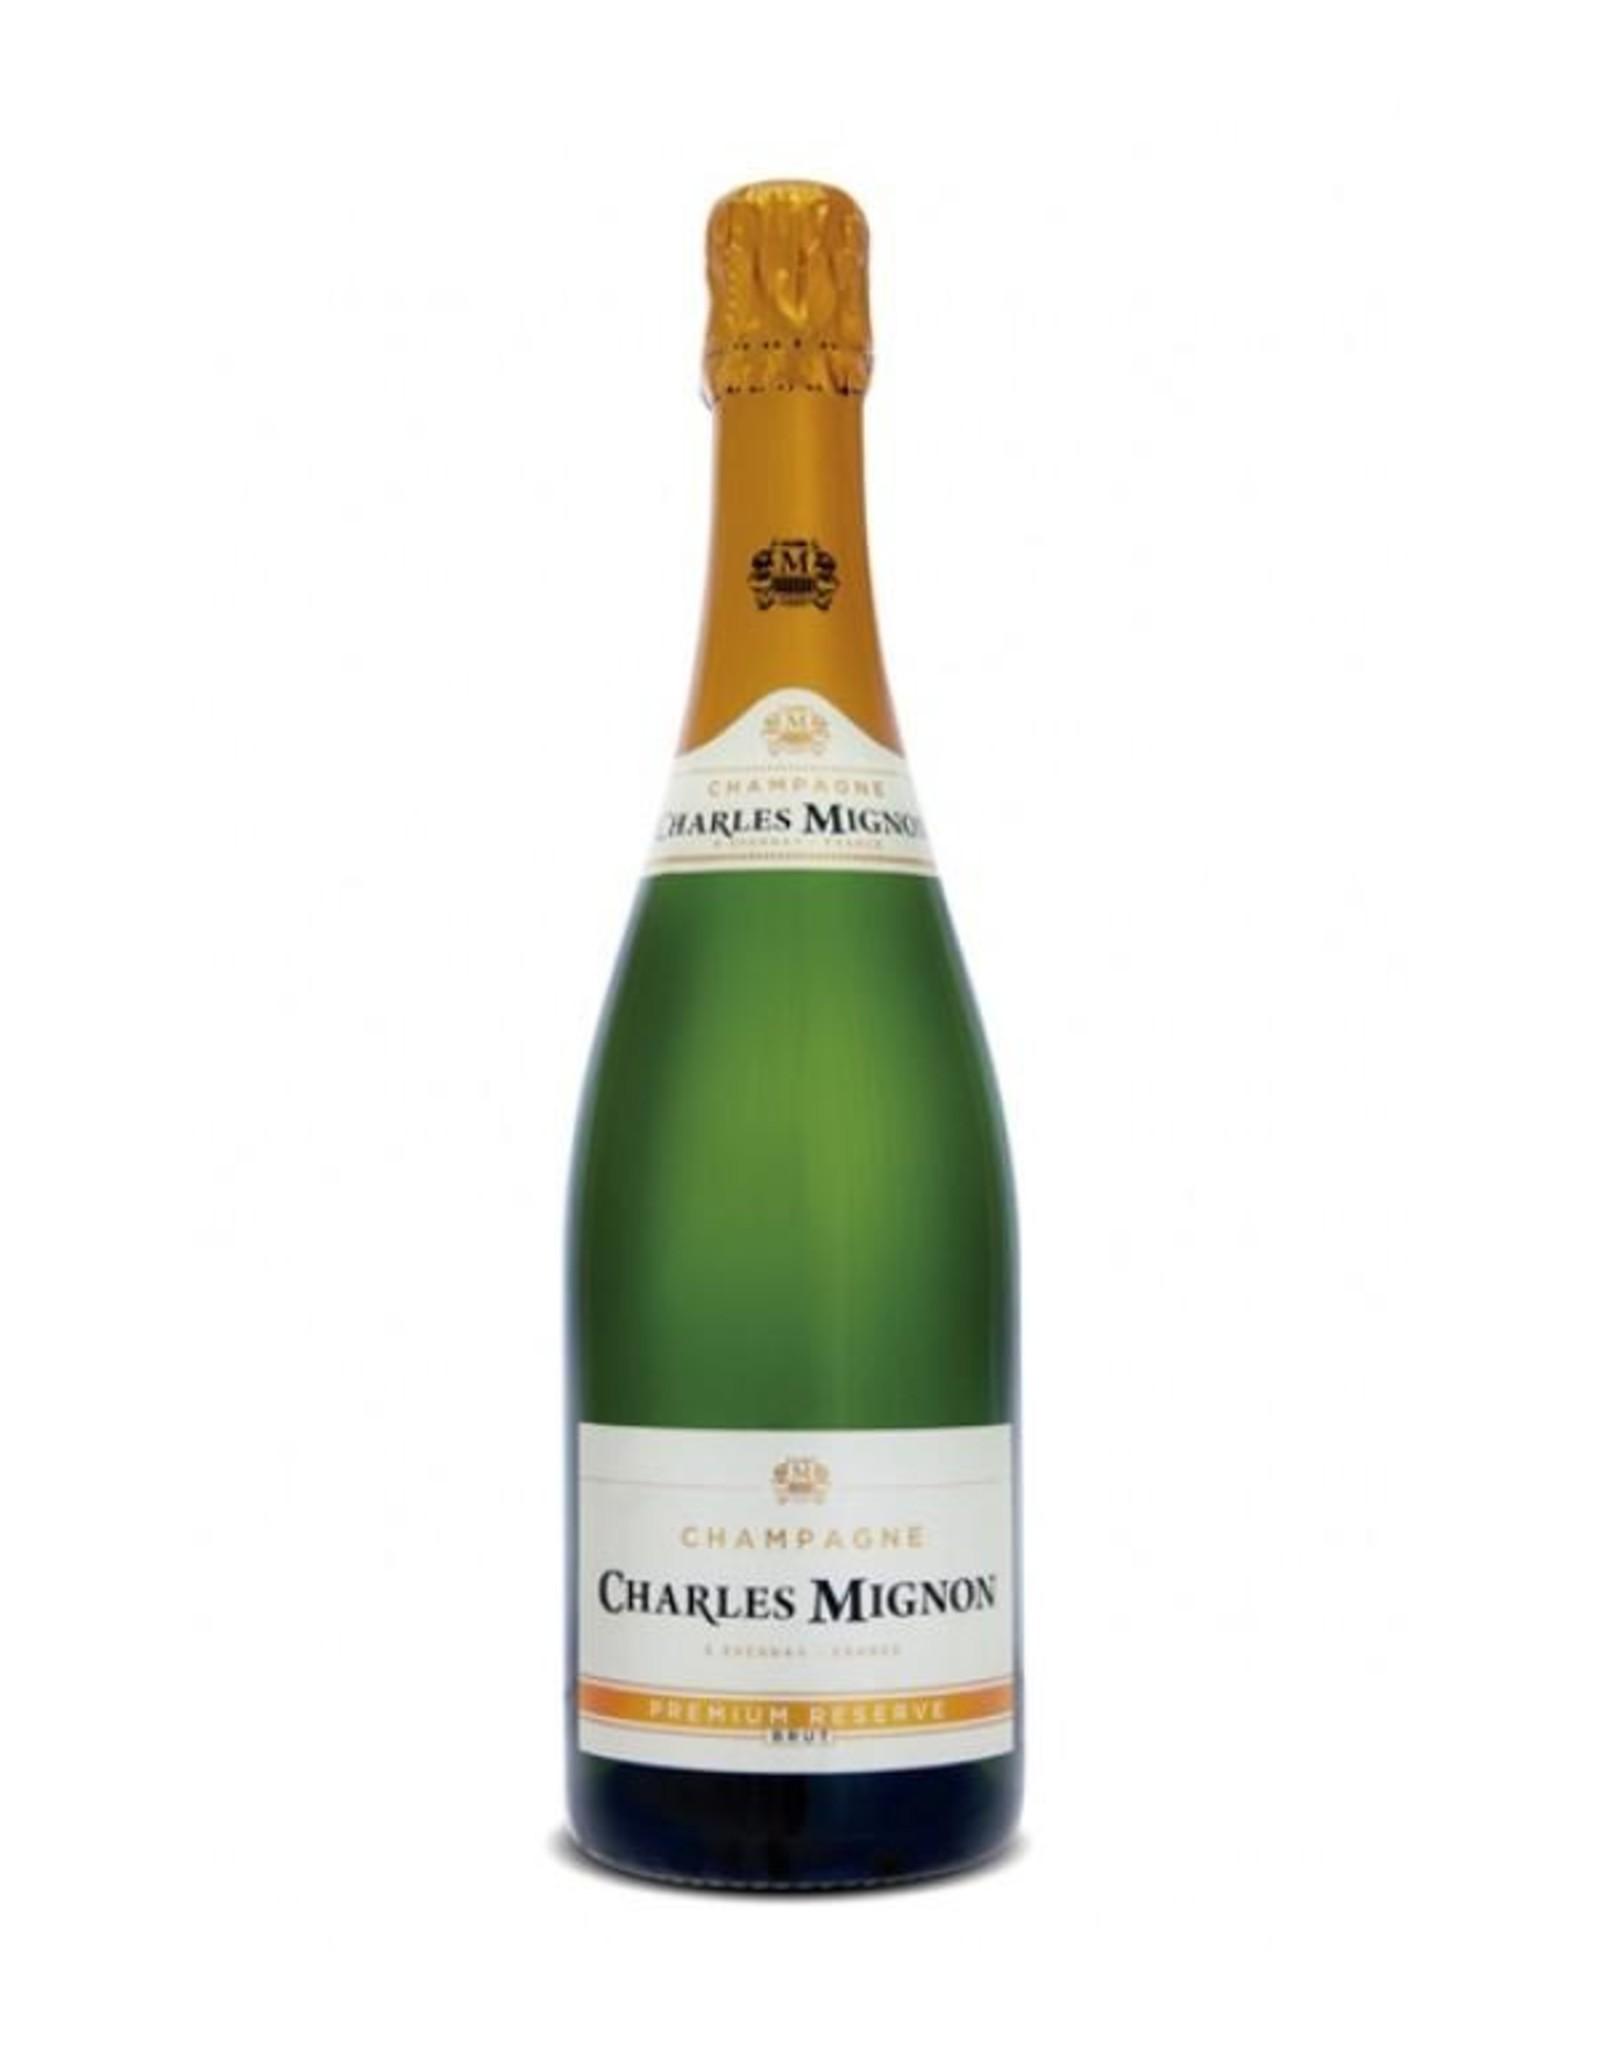 Charles Mignon Premium Reserve Champagne